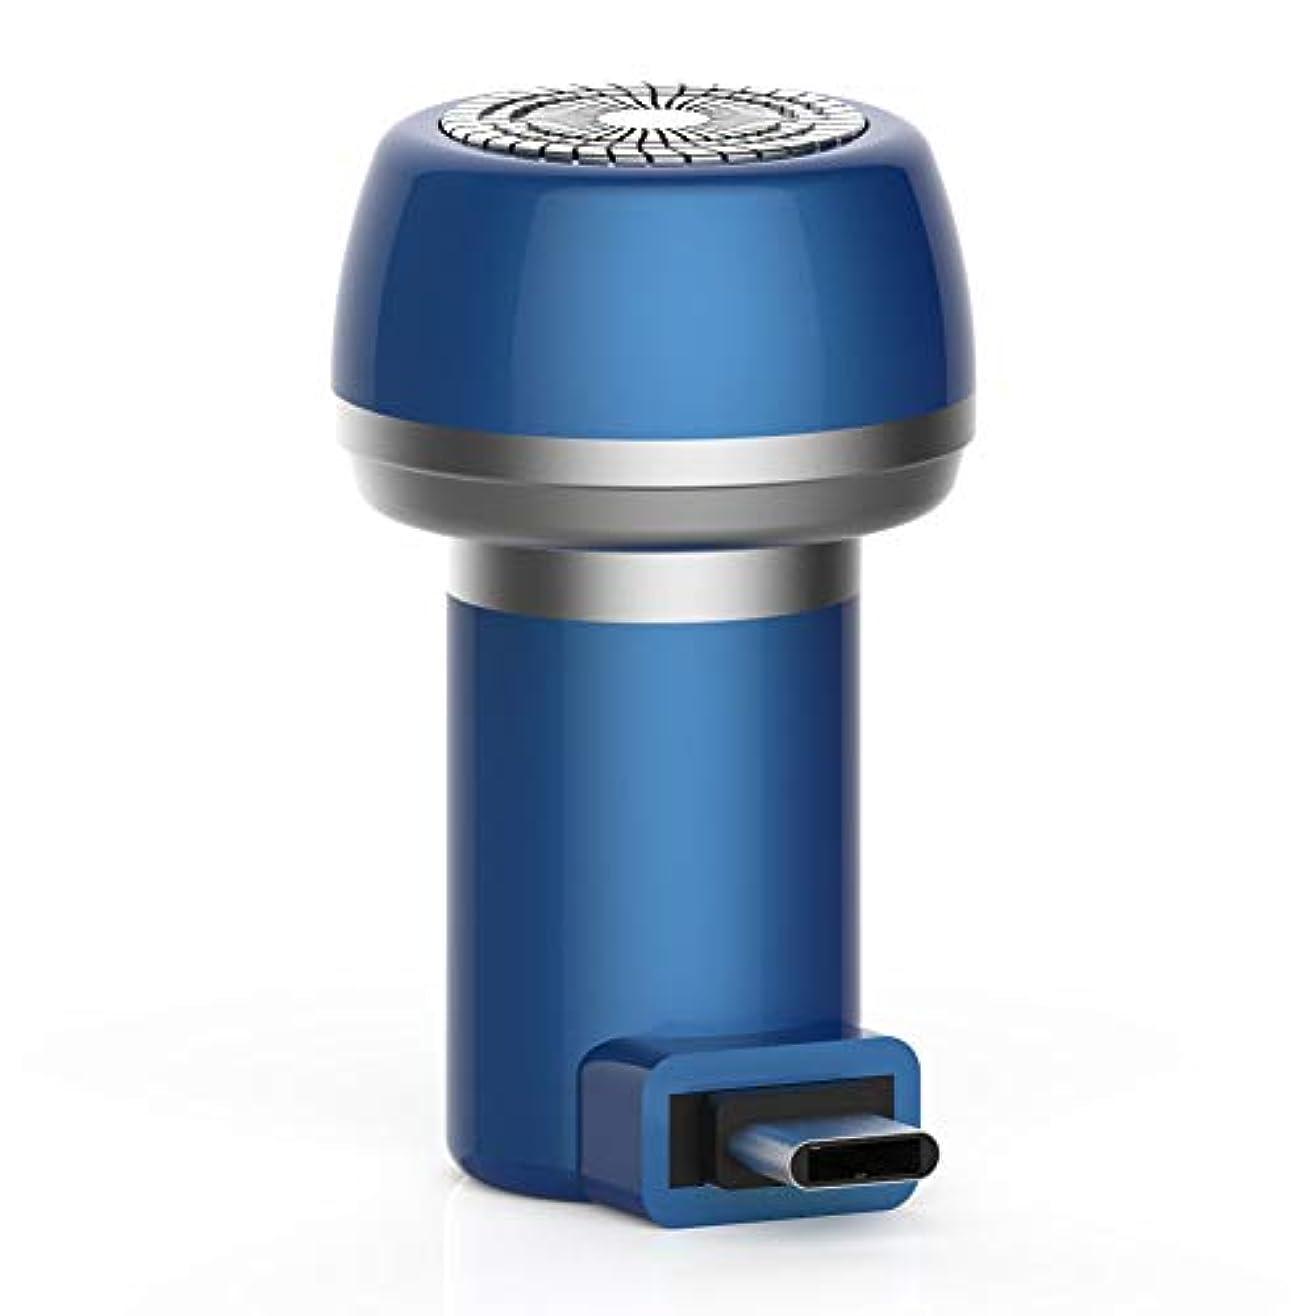 JanusSaja  電気充電式シェーバー、2に付き1磁気電気シェーバーミニポータブルType-C USB防水耐久性剃刀